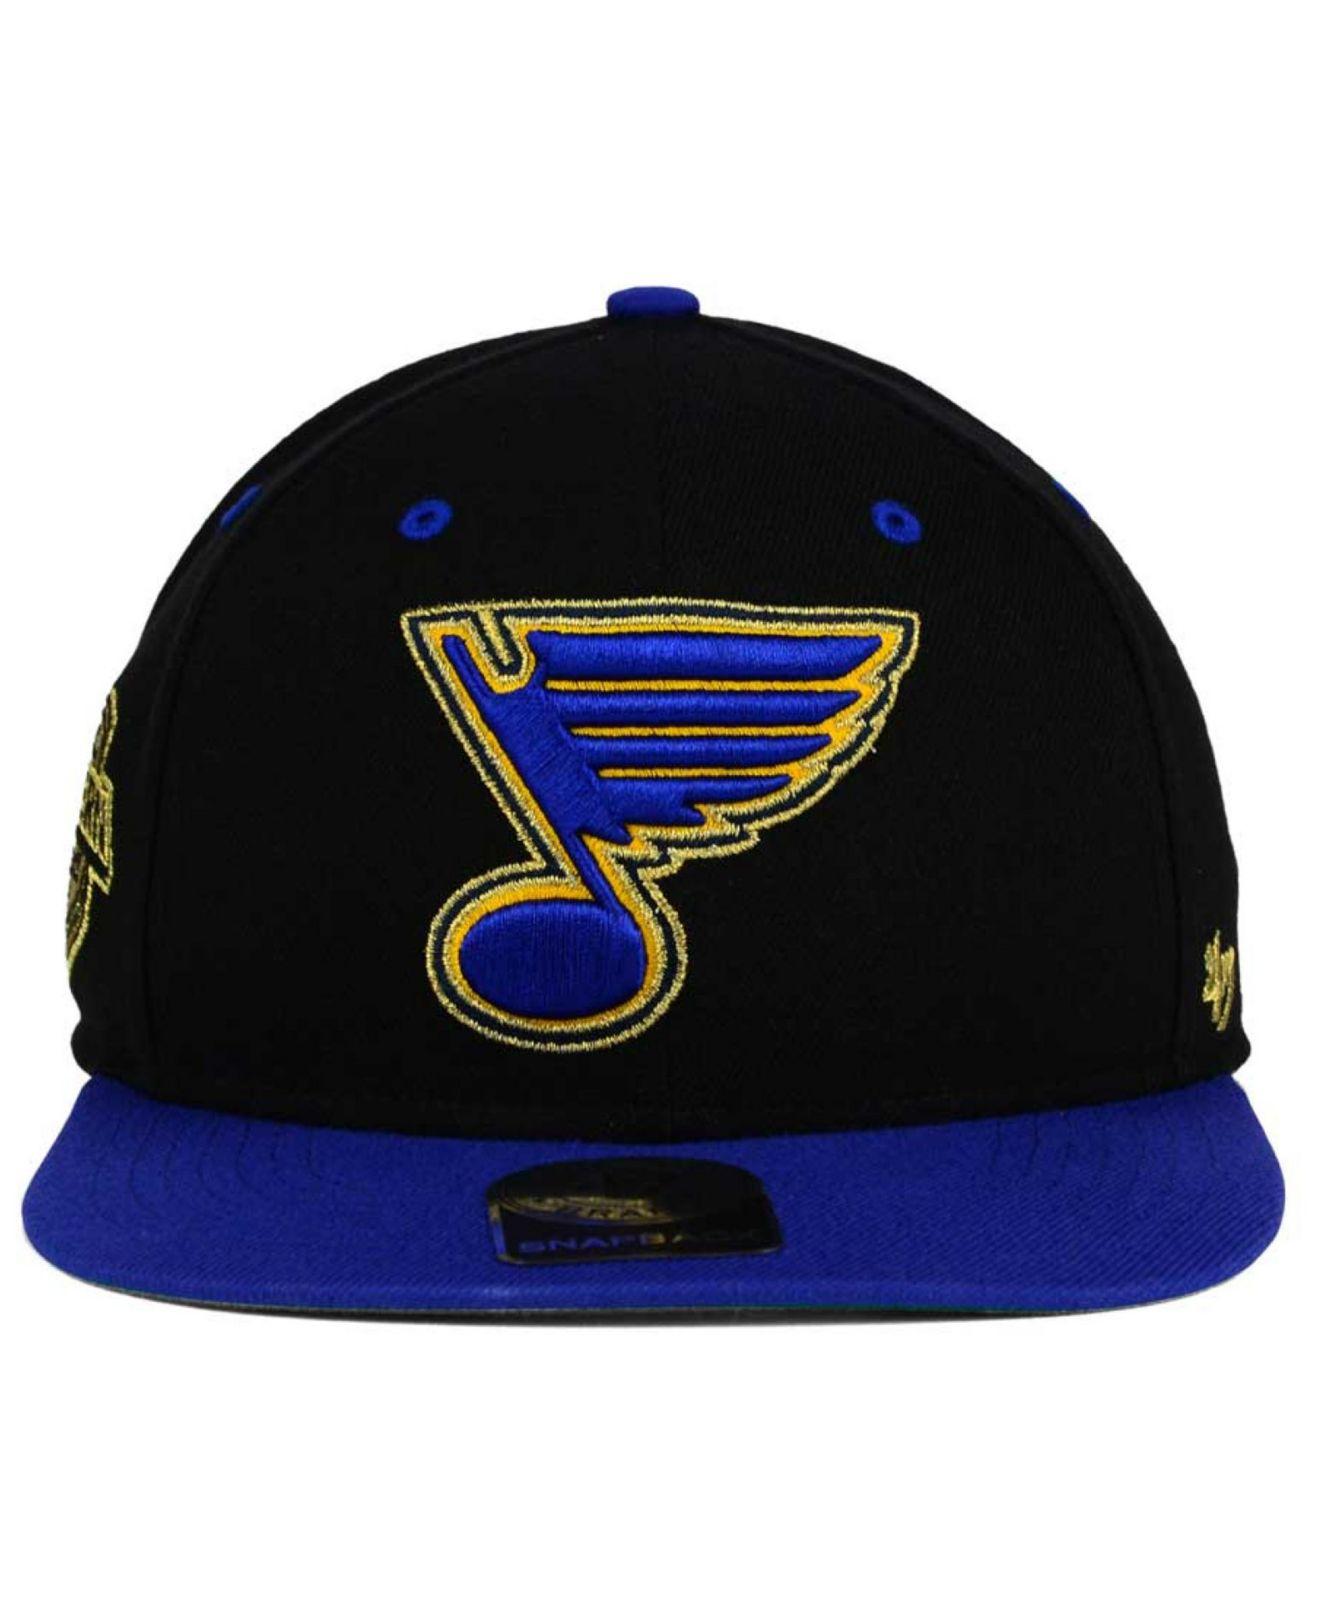 new style 4e282 cfa29 ... netherlands lyst 47 brand st. louis blues gold rush snapback cap in  black for men